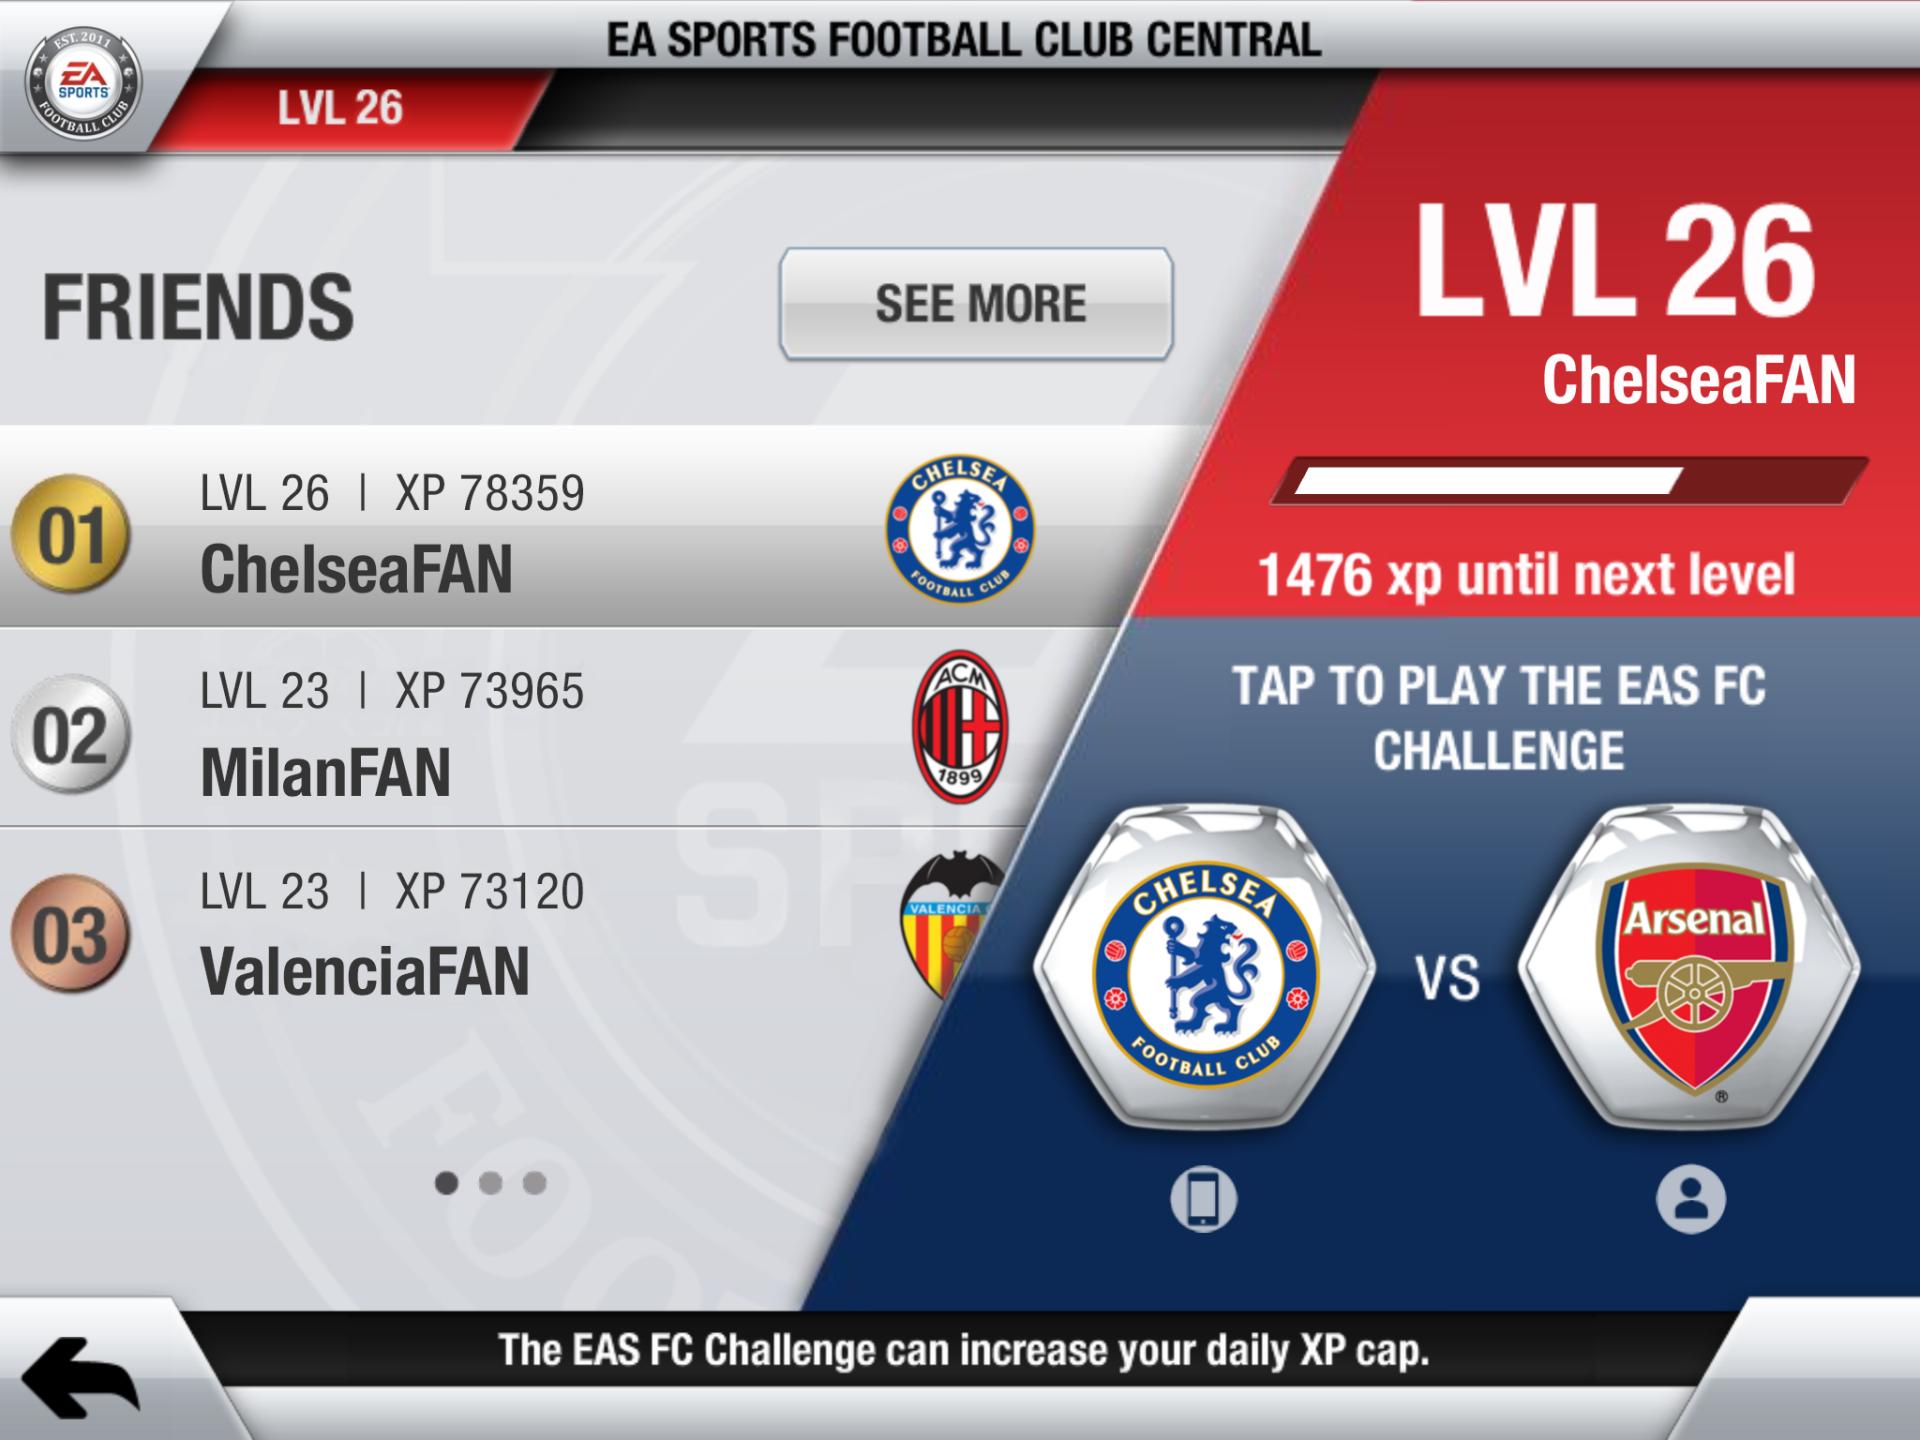 Obrázky z iOS verze FIFA 13 70835